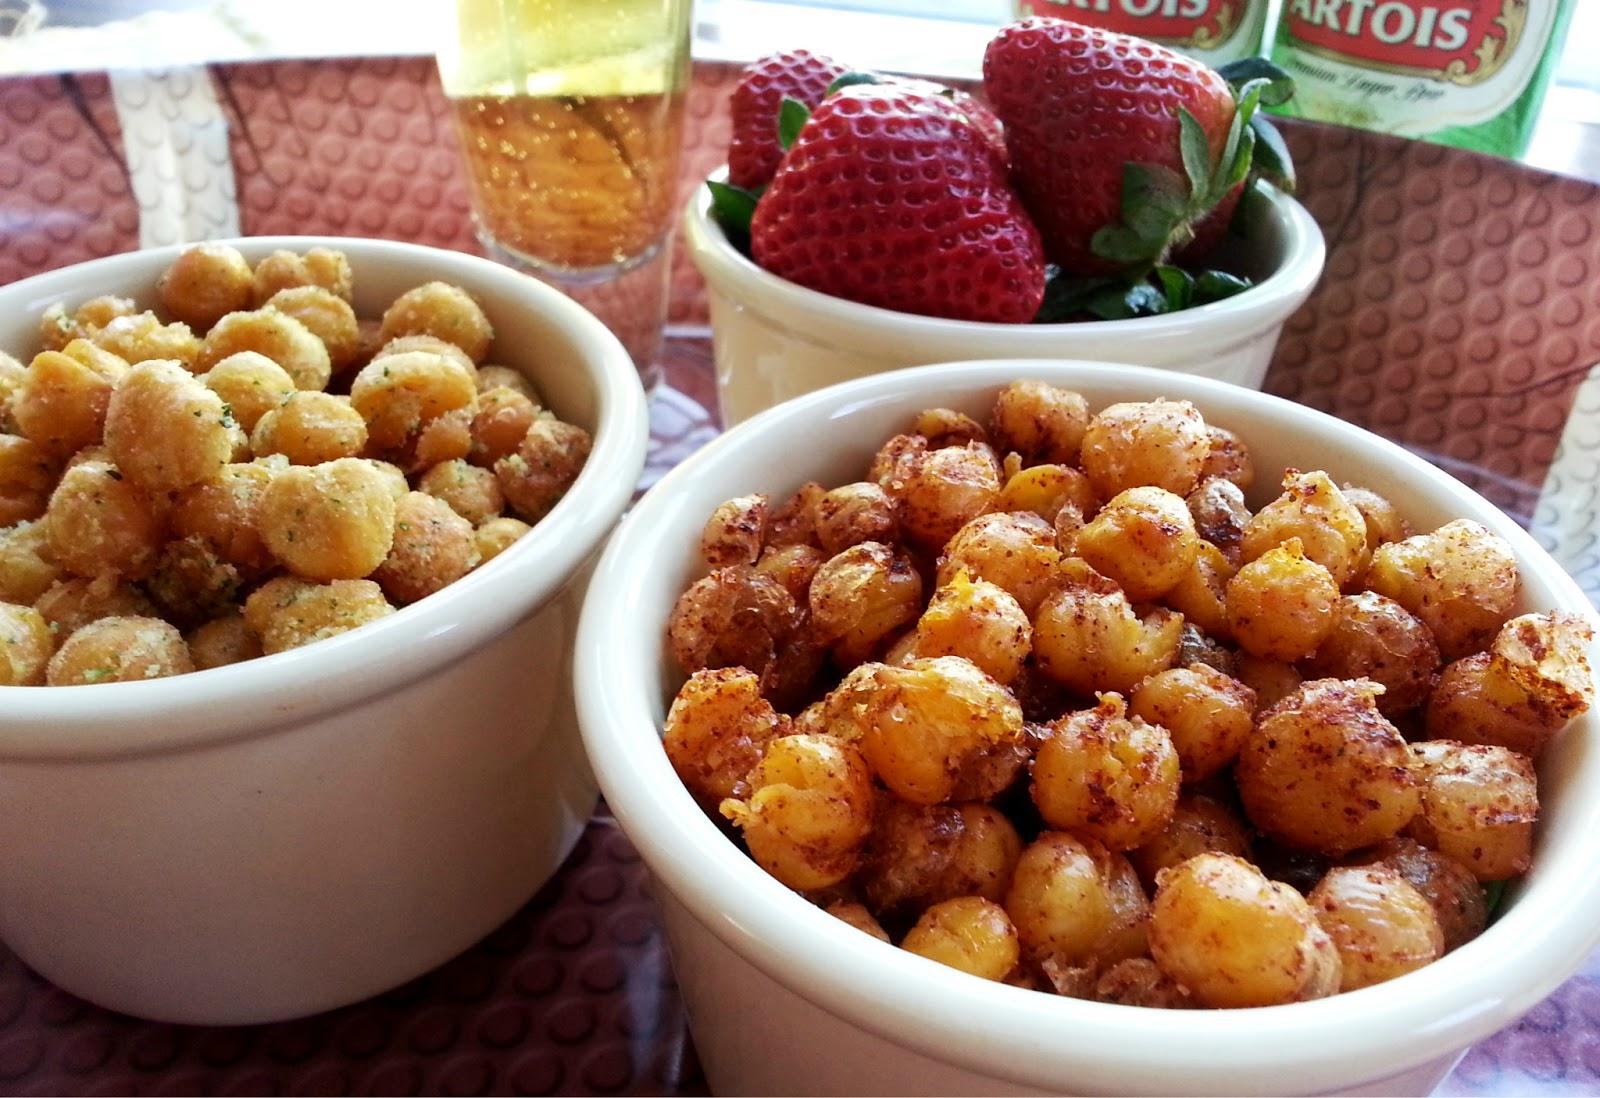 Fried Chickpeas